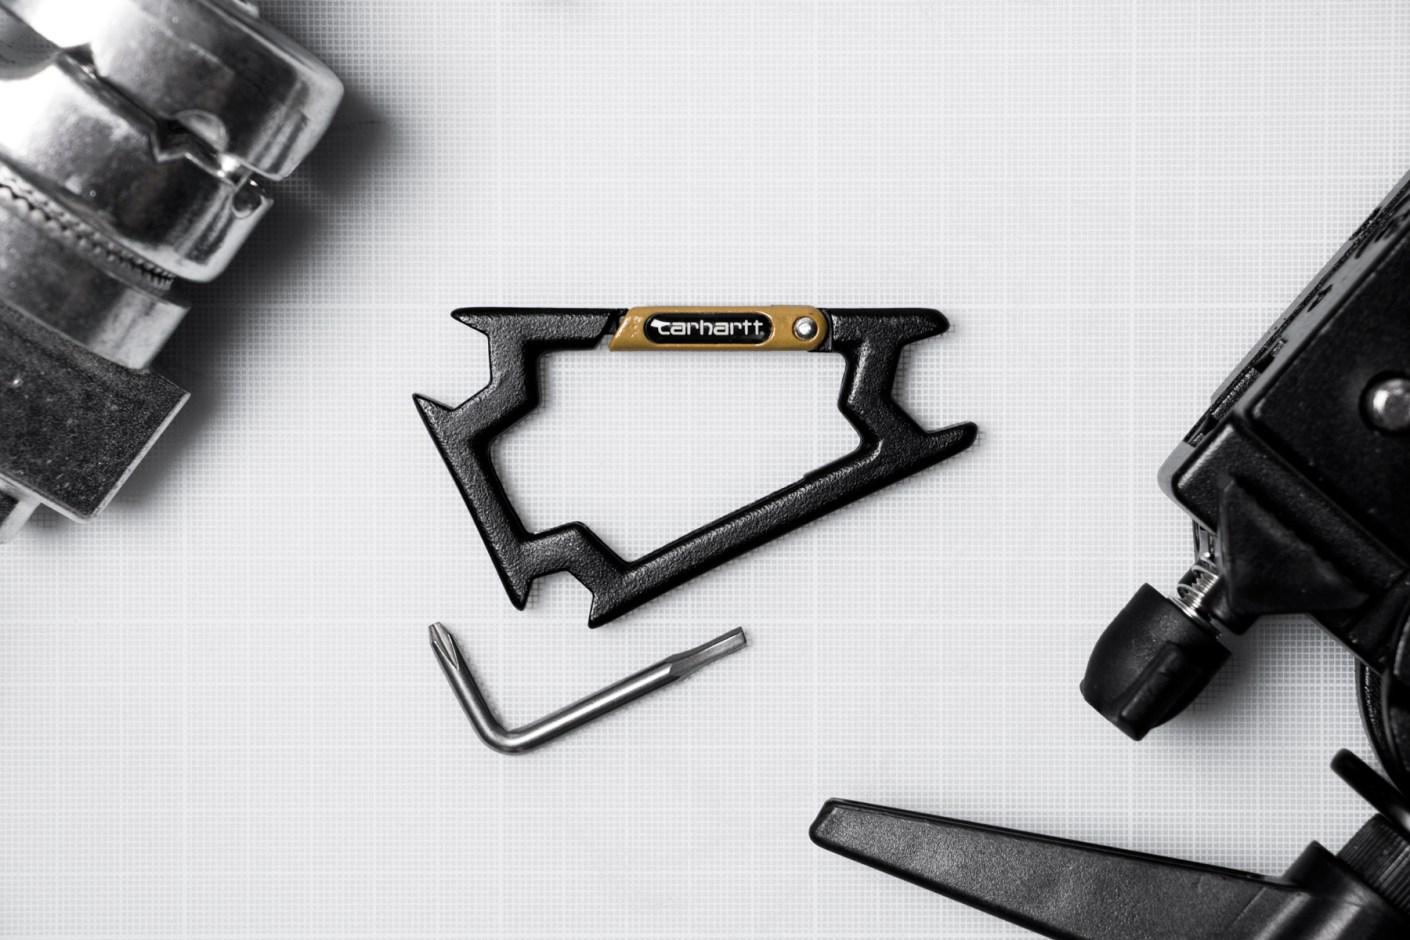 Image of Carhartt WIP x Sk8ology Skateboard Tool Carabiner